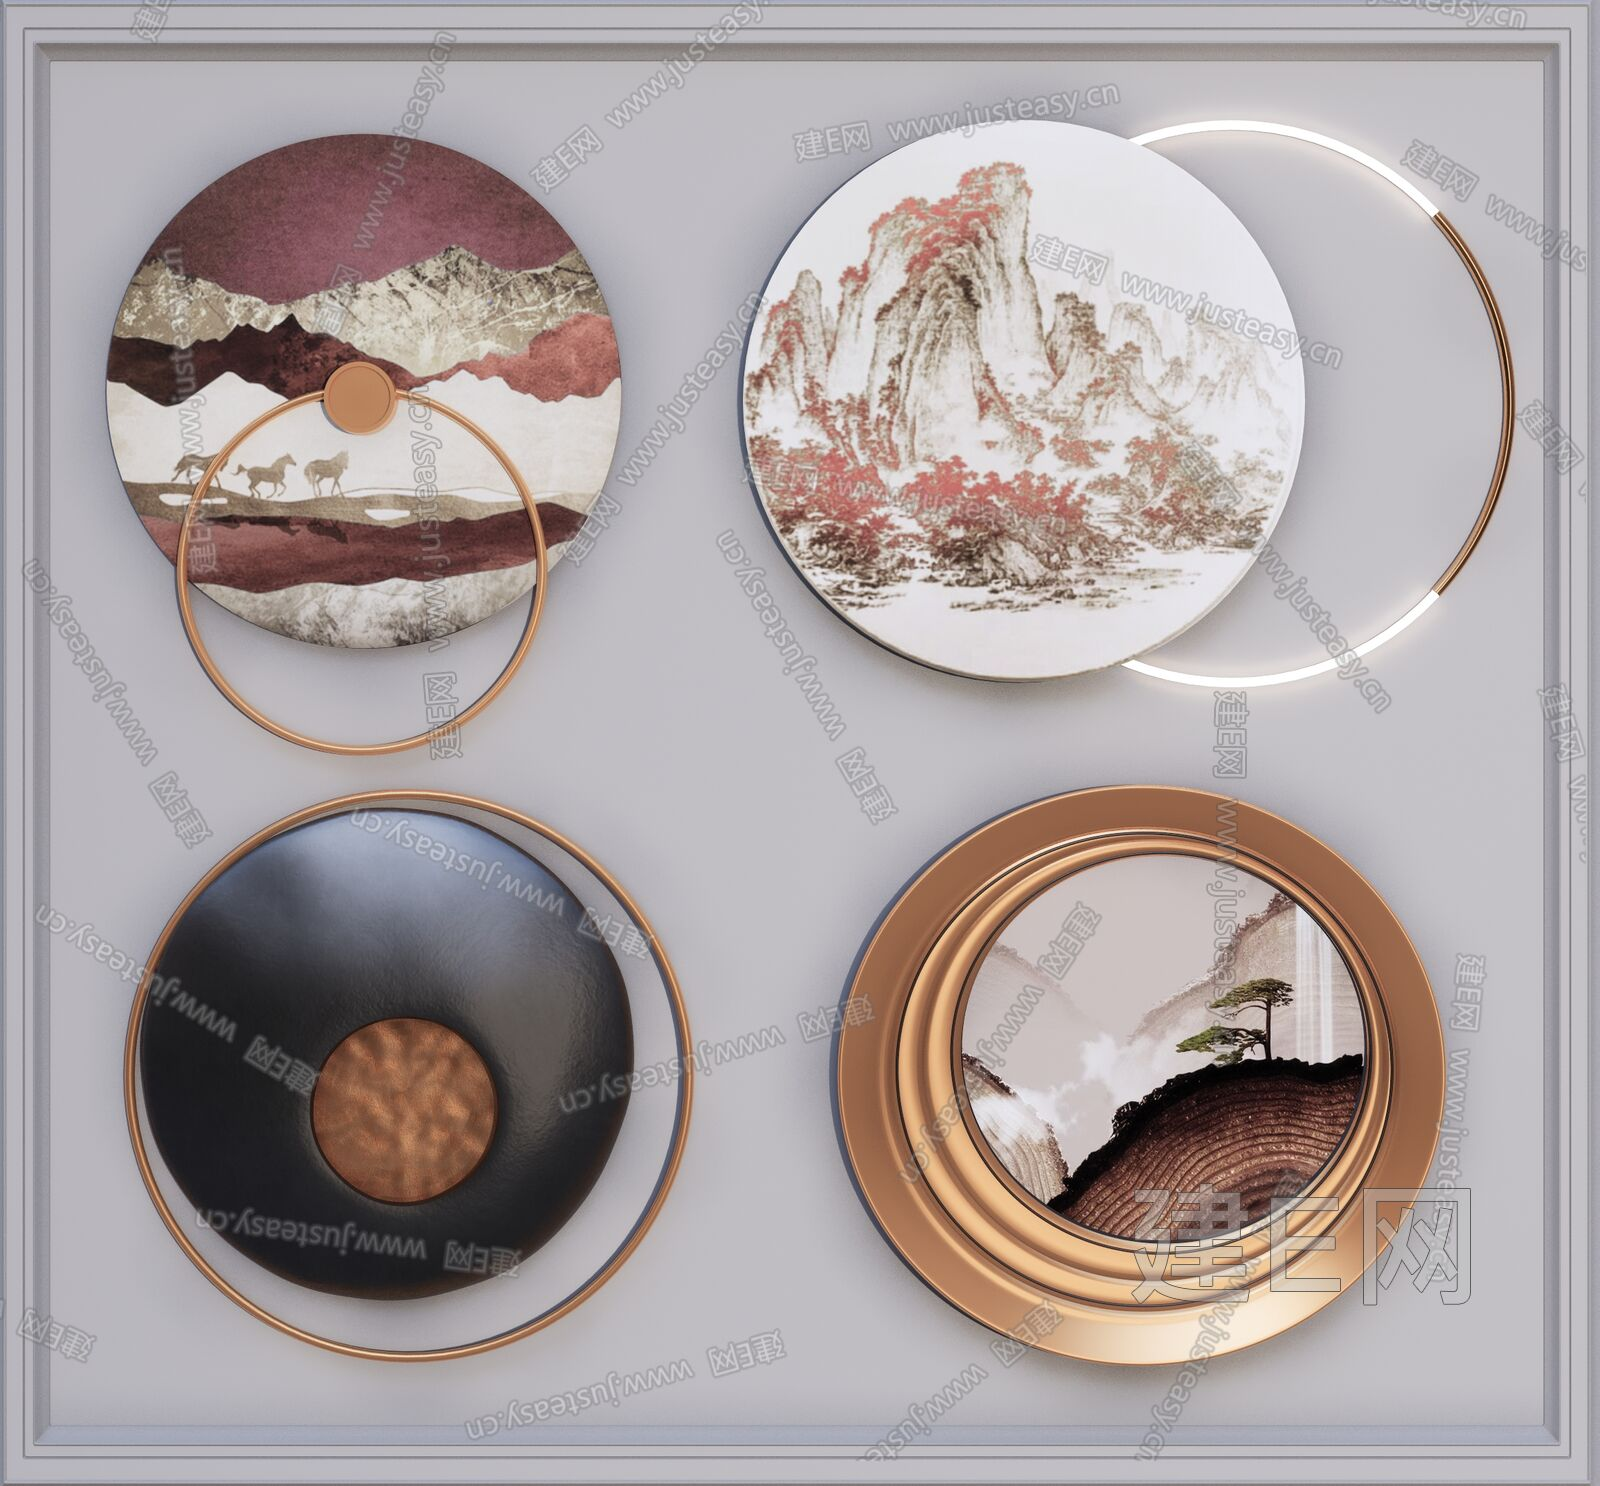 新中式装饰品sketchup模型